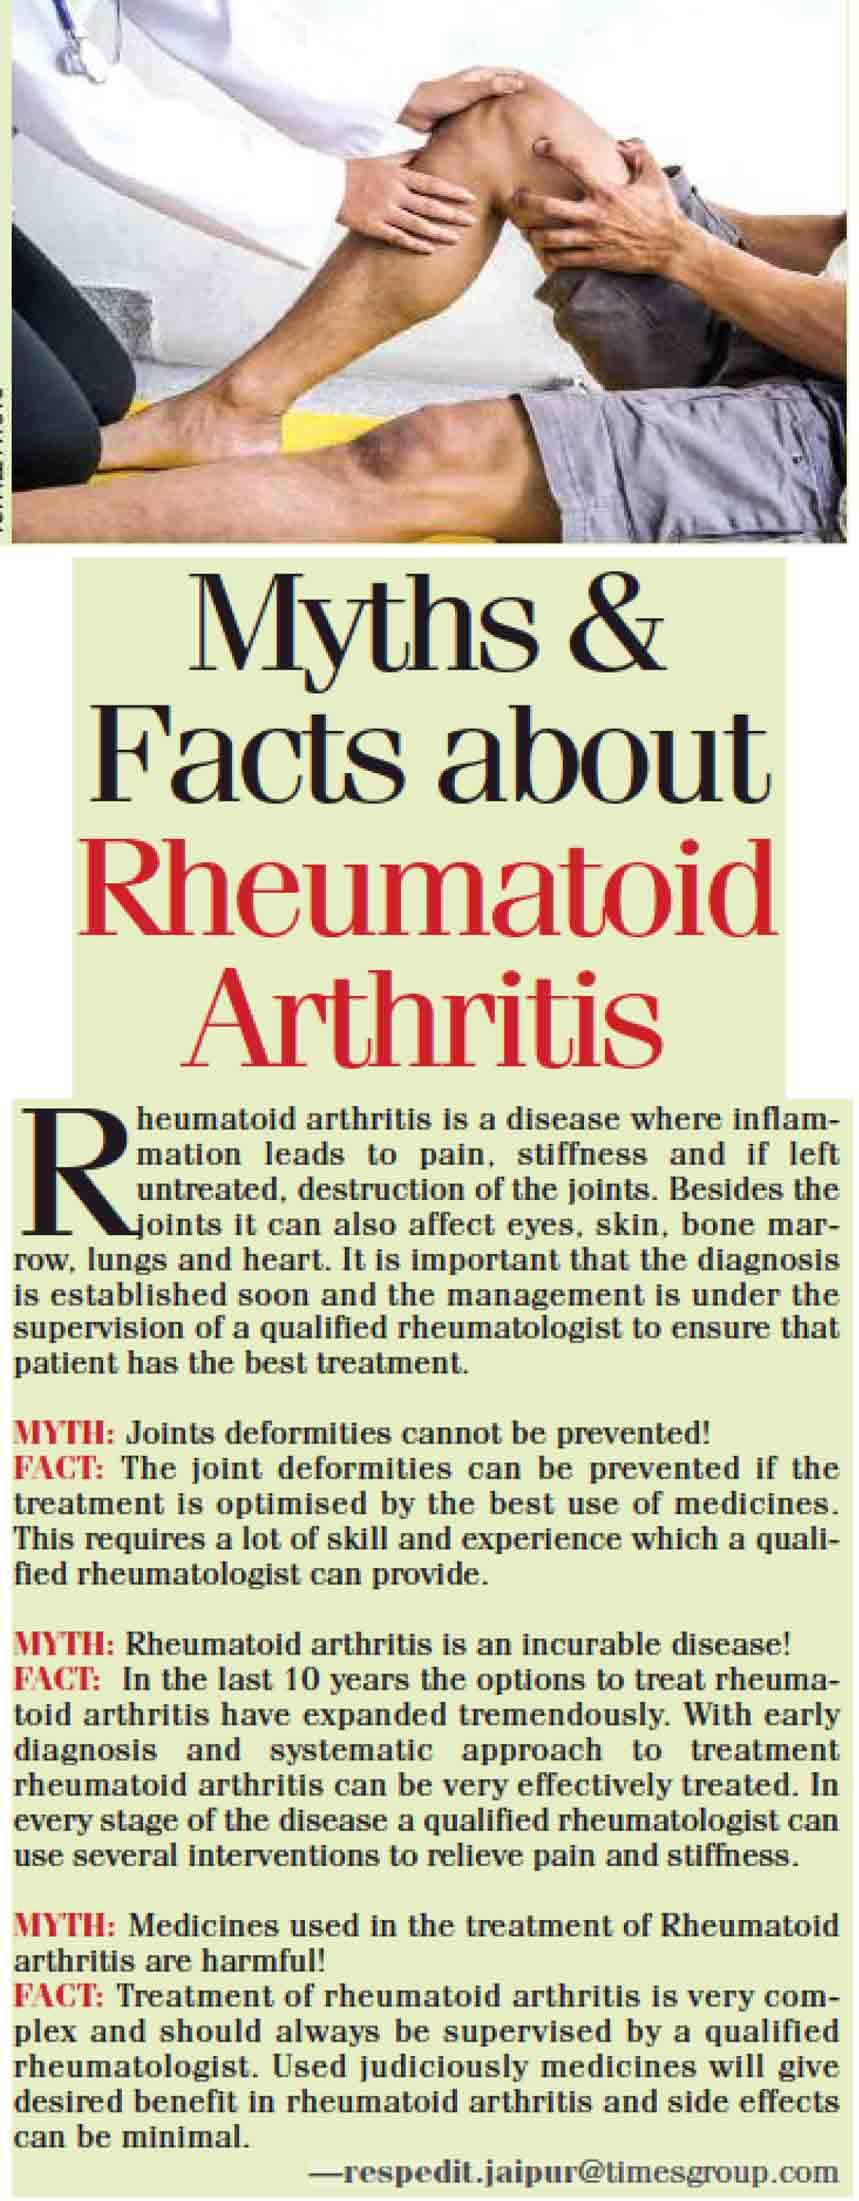 Myths & facts about rheumatoid arthritis